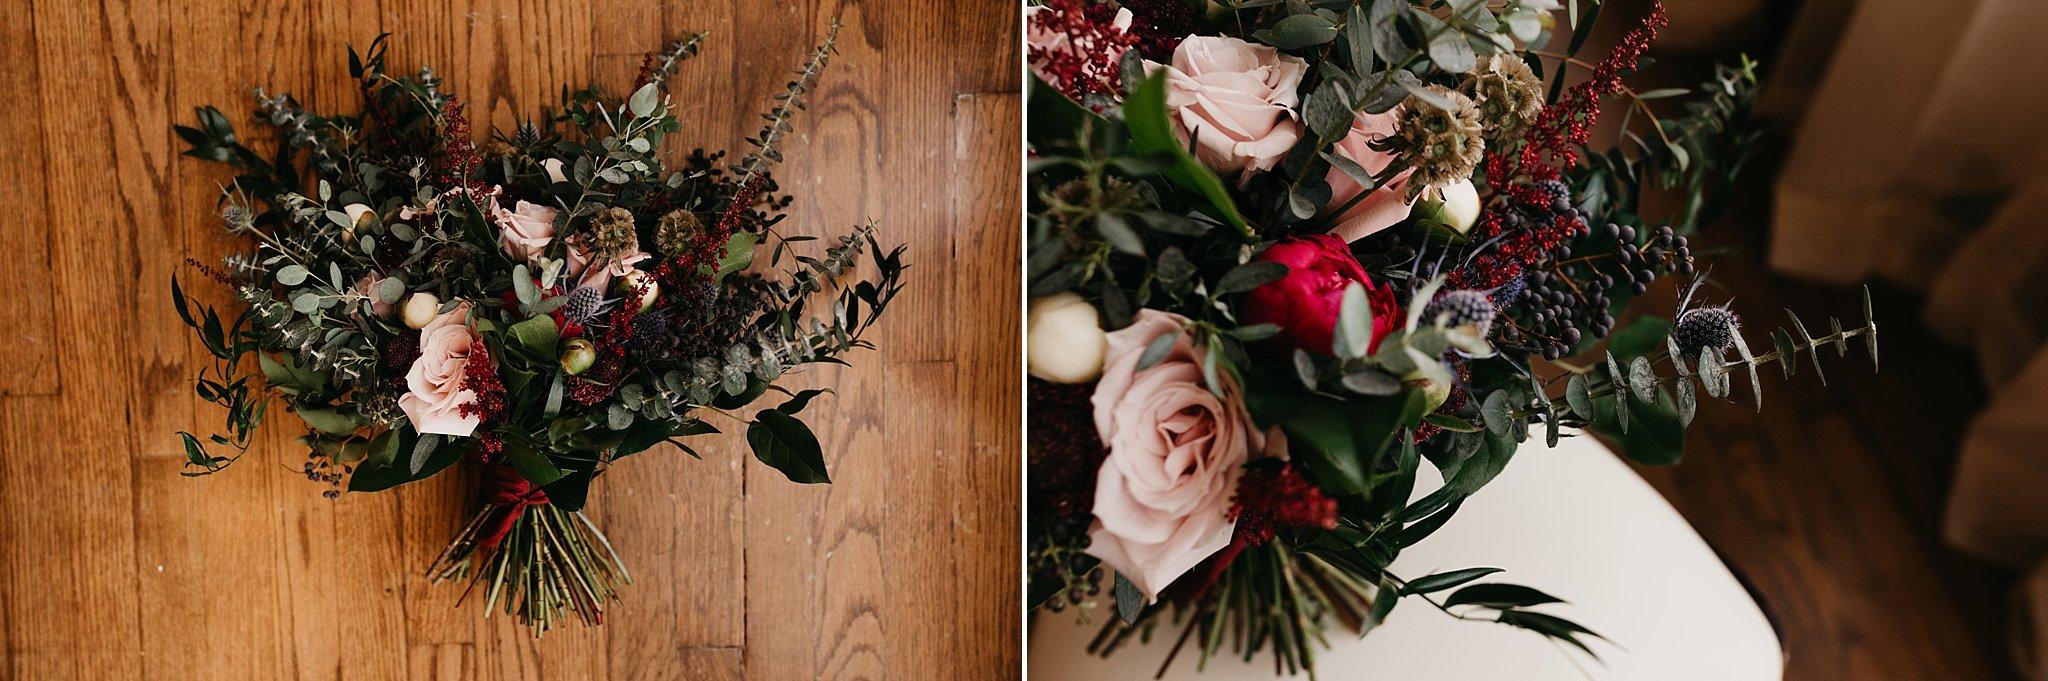 Wilderlove Co_Waco Texas_The Phoenix_Romantic Wedding Photography_0006.jpg